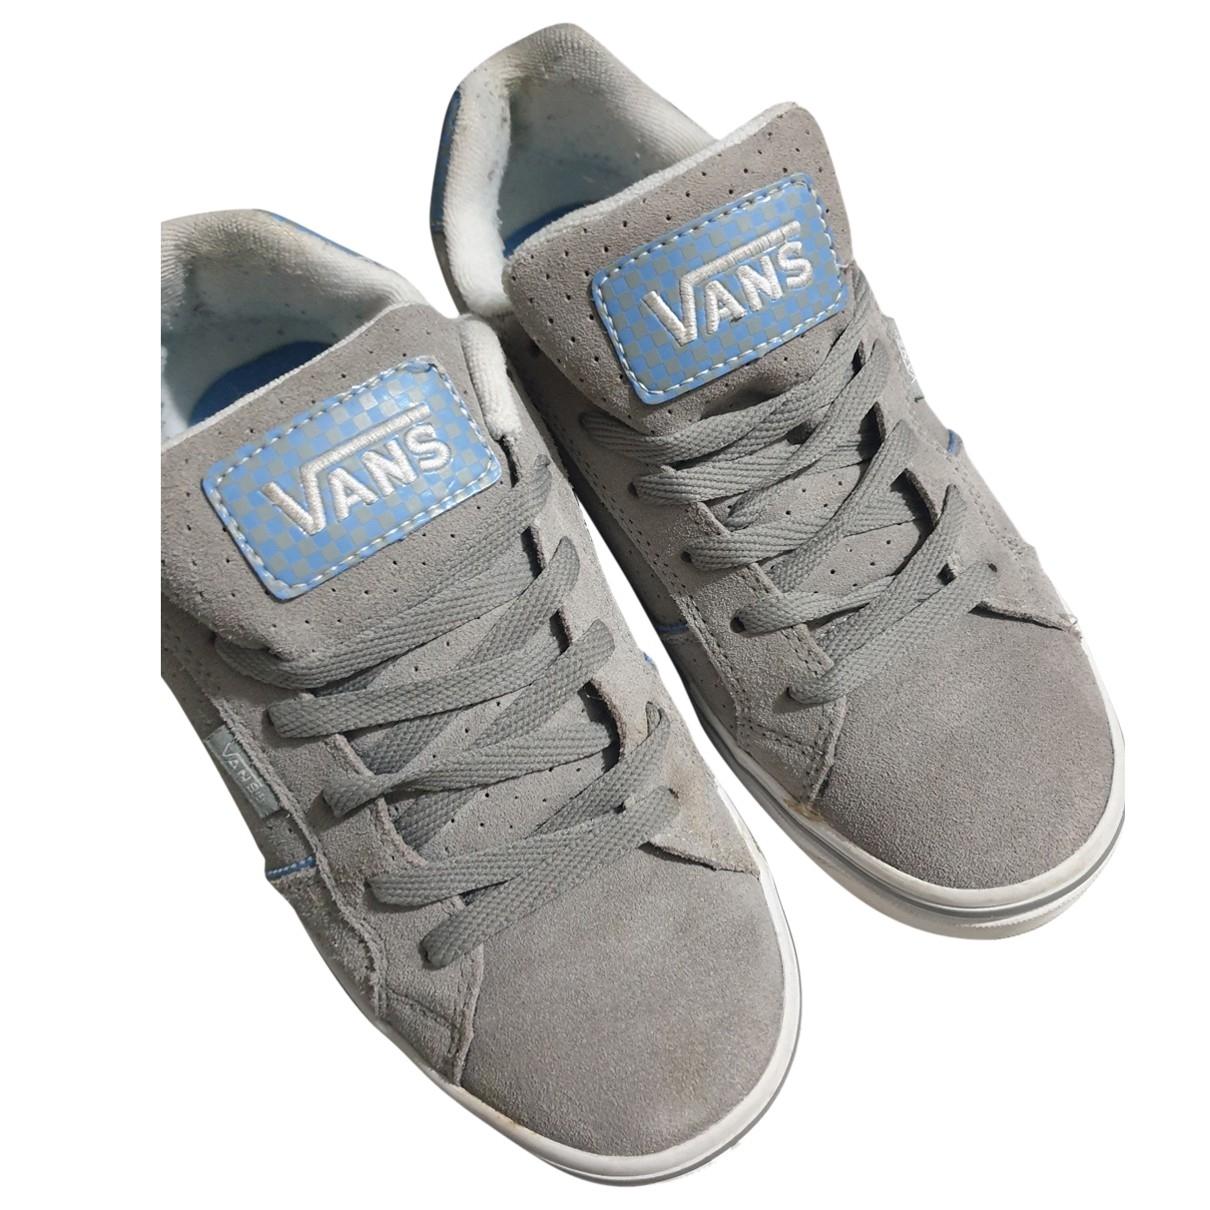 Vans \N Sneakers in  Beige Leinen